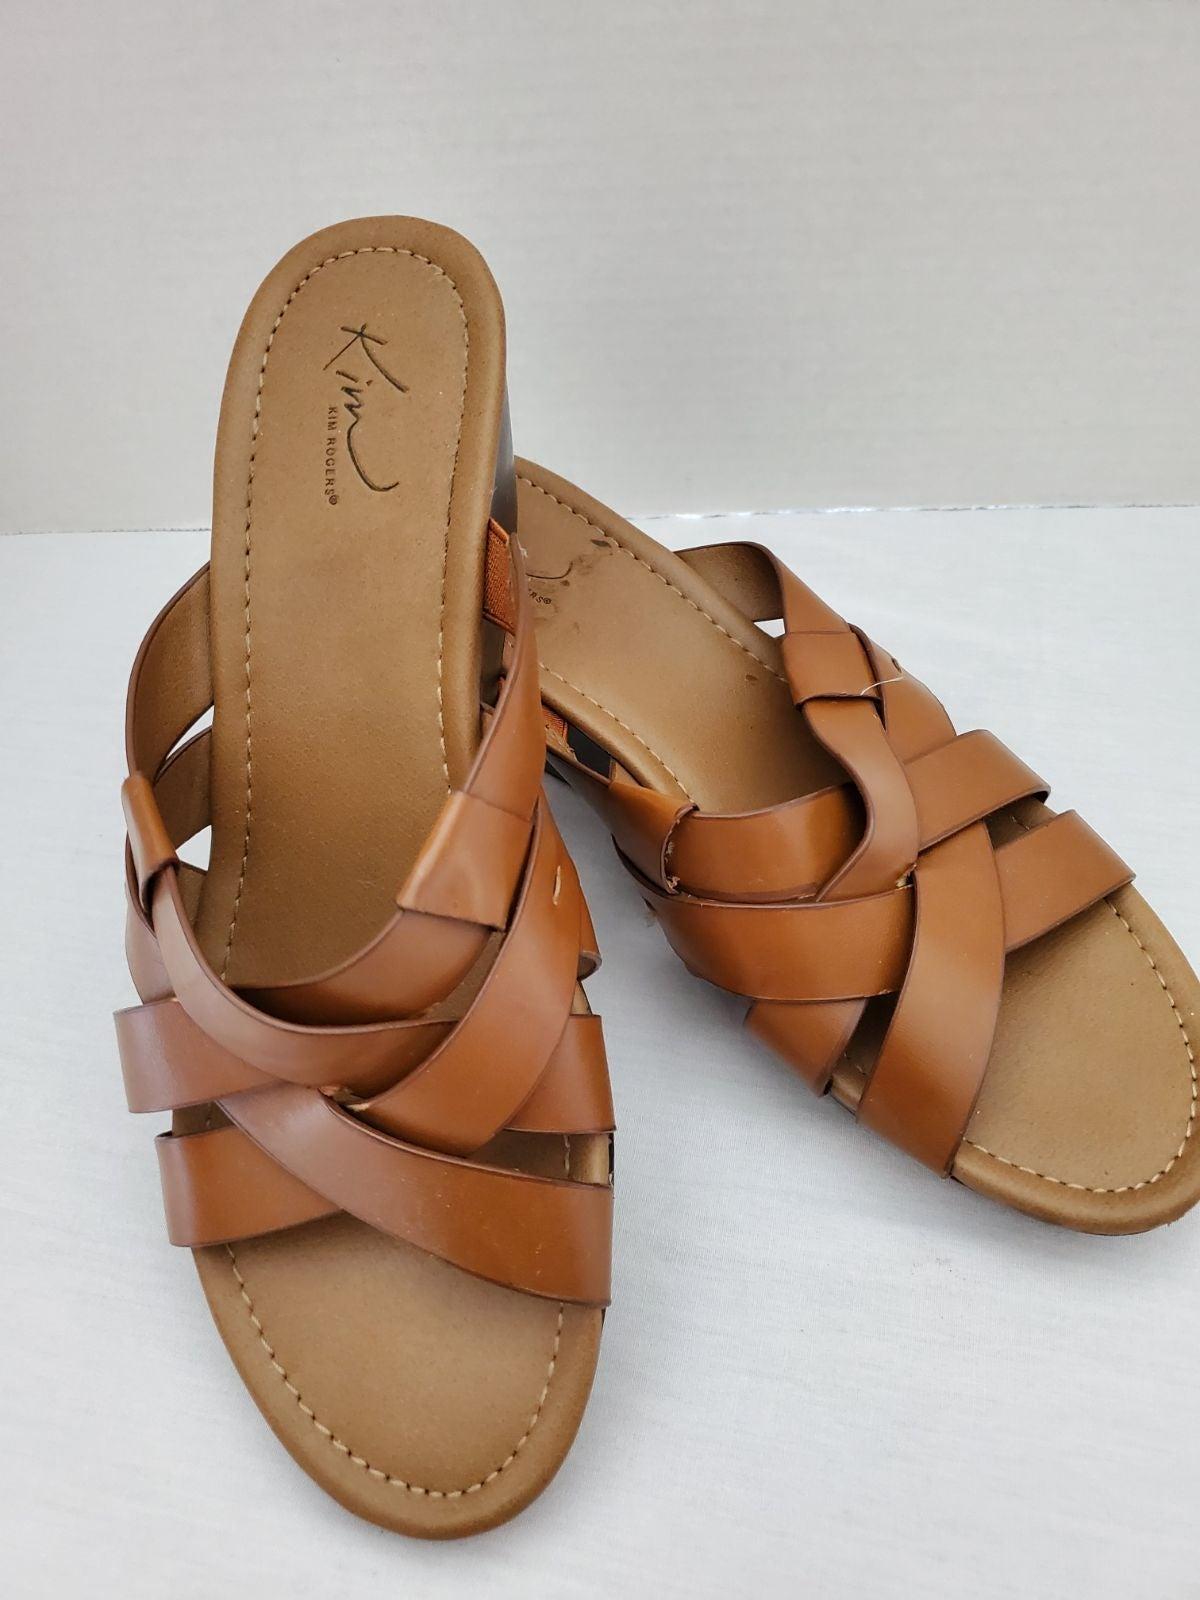 Sandals wedge 9.5 women